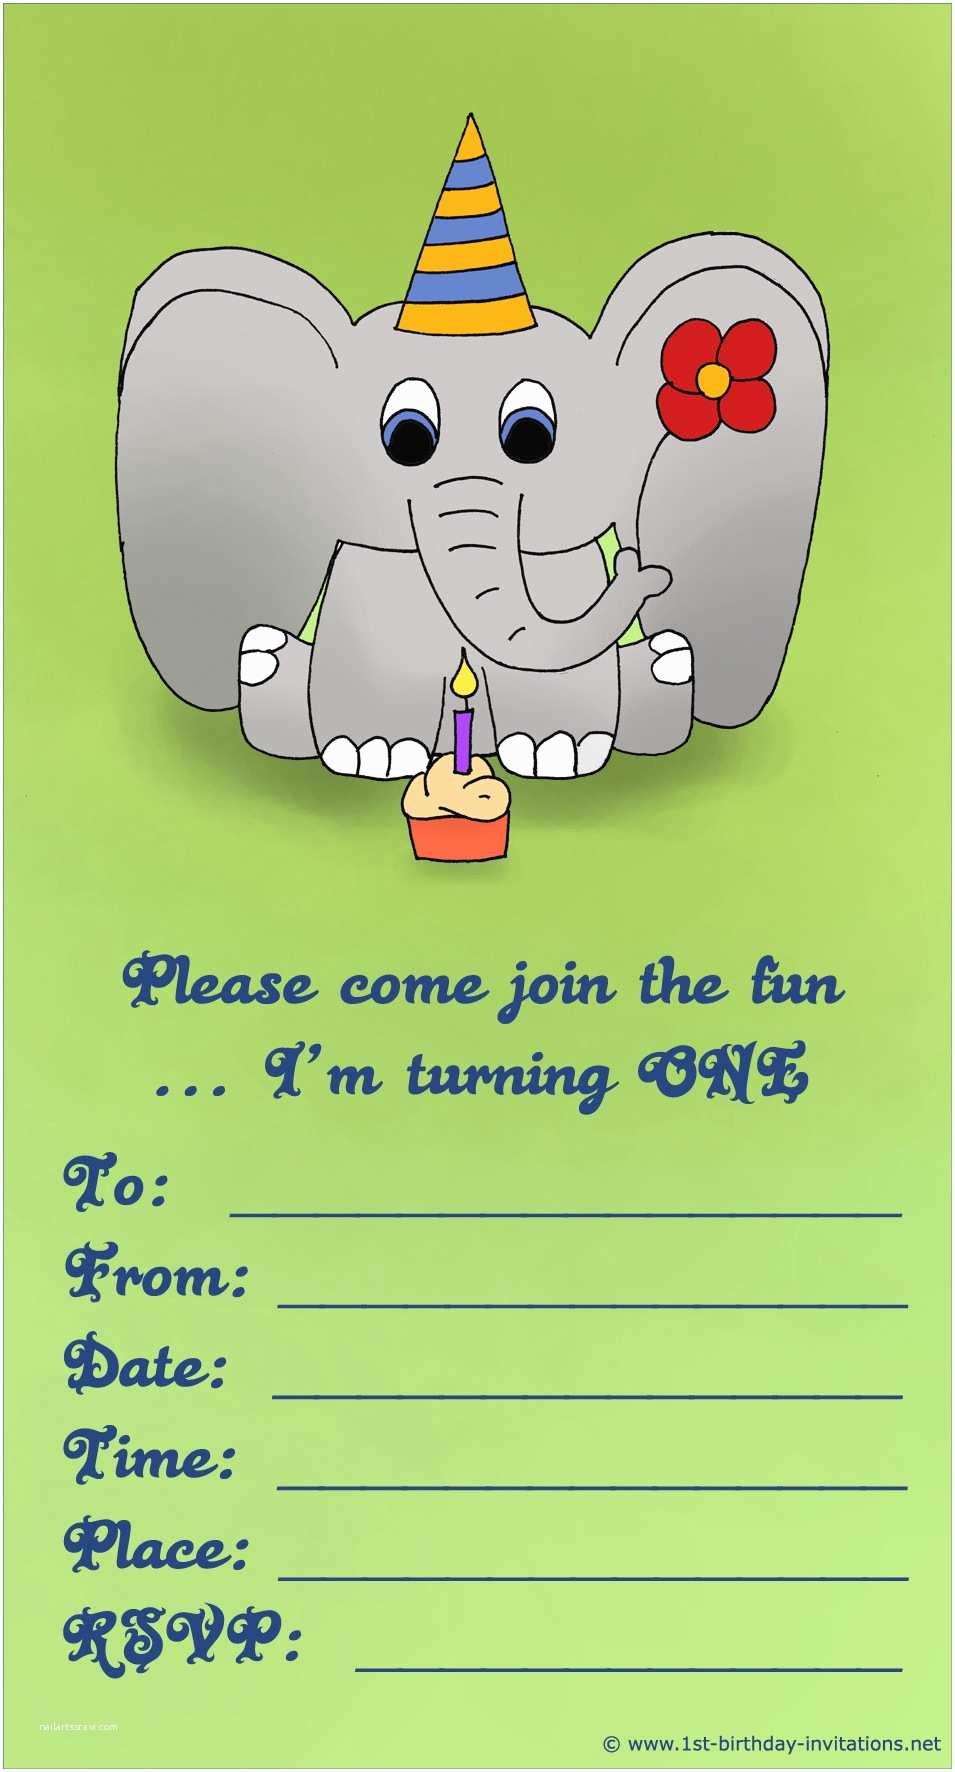 Cute Birthday Invitations 20 Cute 1st Birthday Invitations Free Printable and